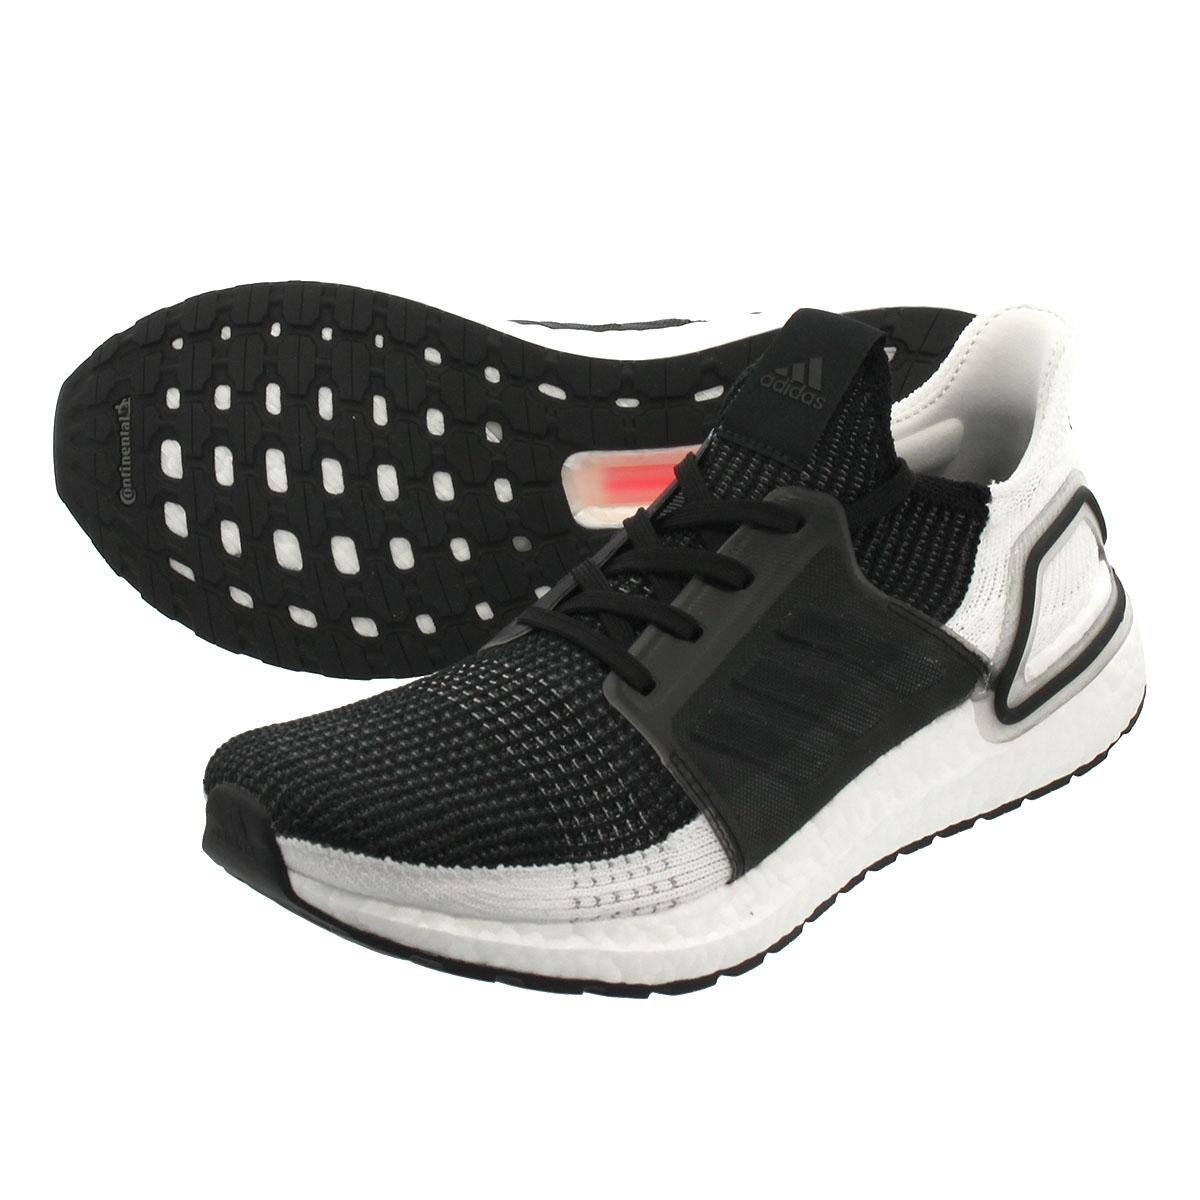 Adidas Ultraboost 19 Core Black B37704